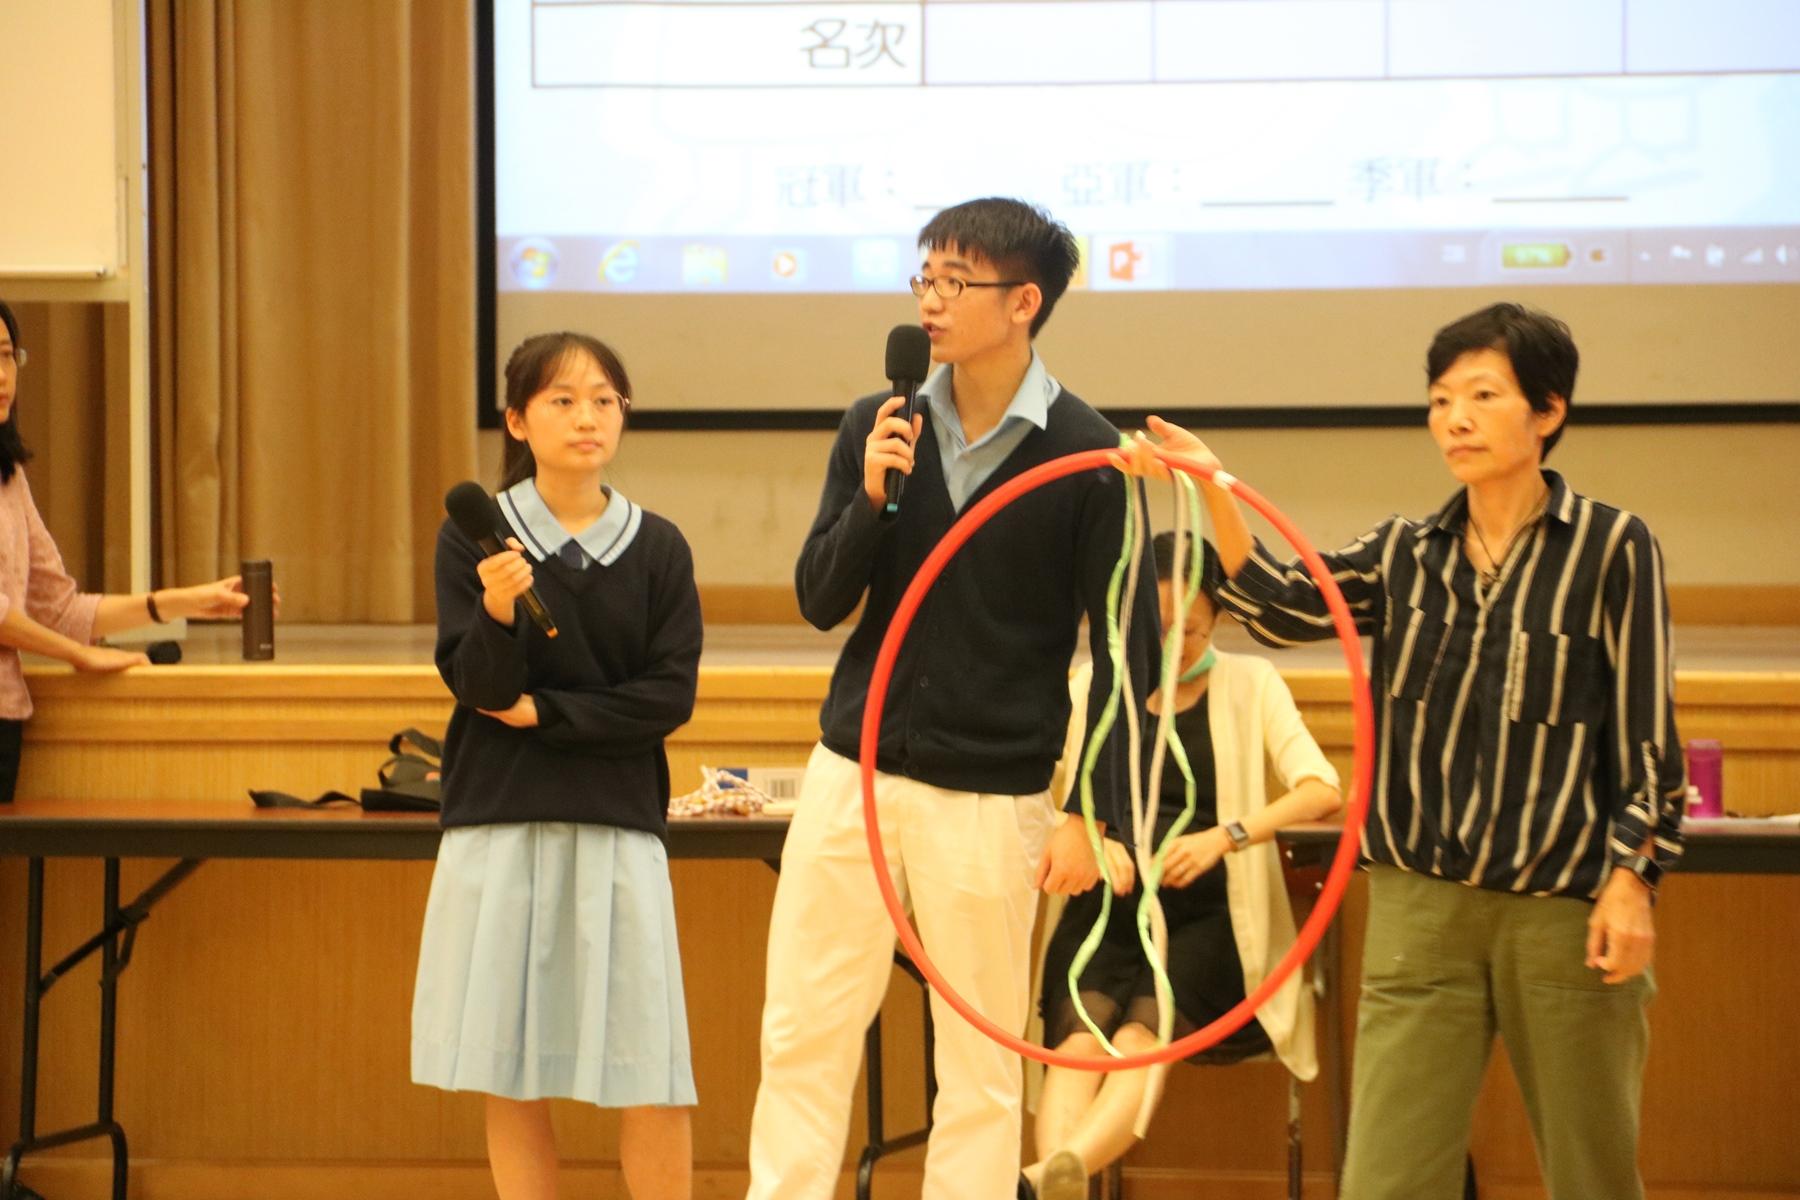 http://npc.edu.hk/sites/default/files/img_6403.jpg